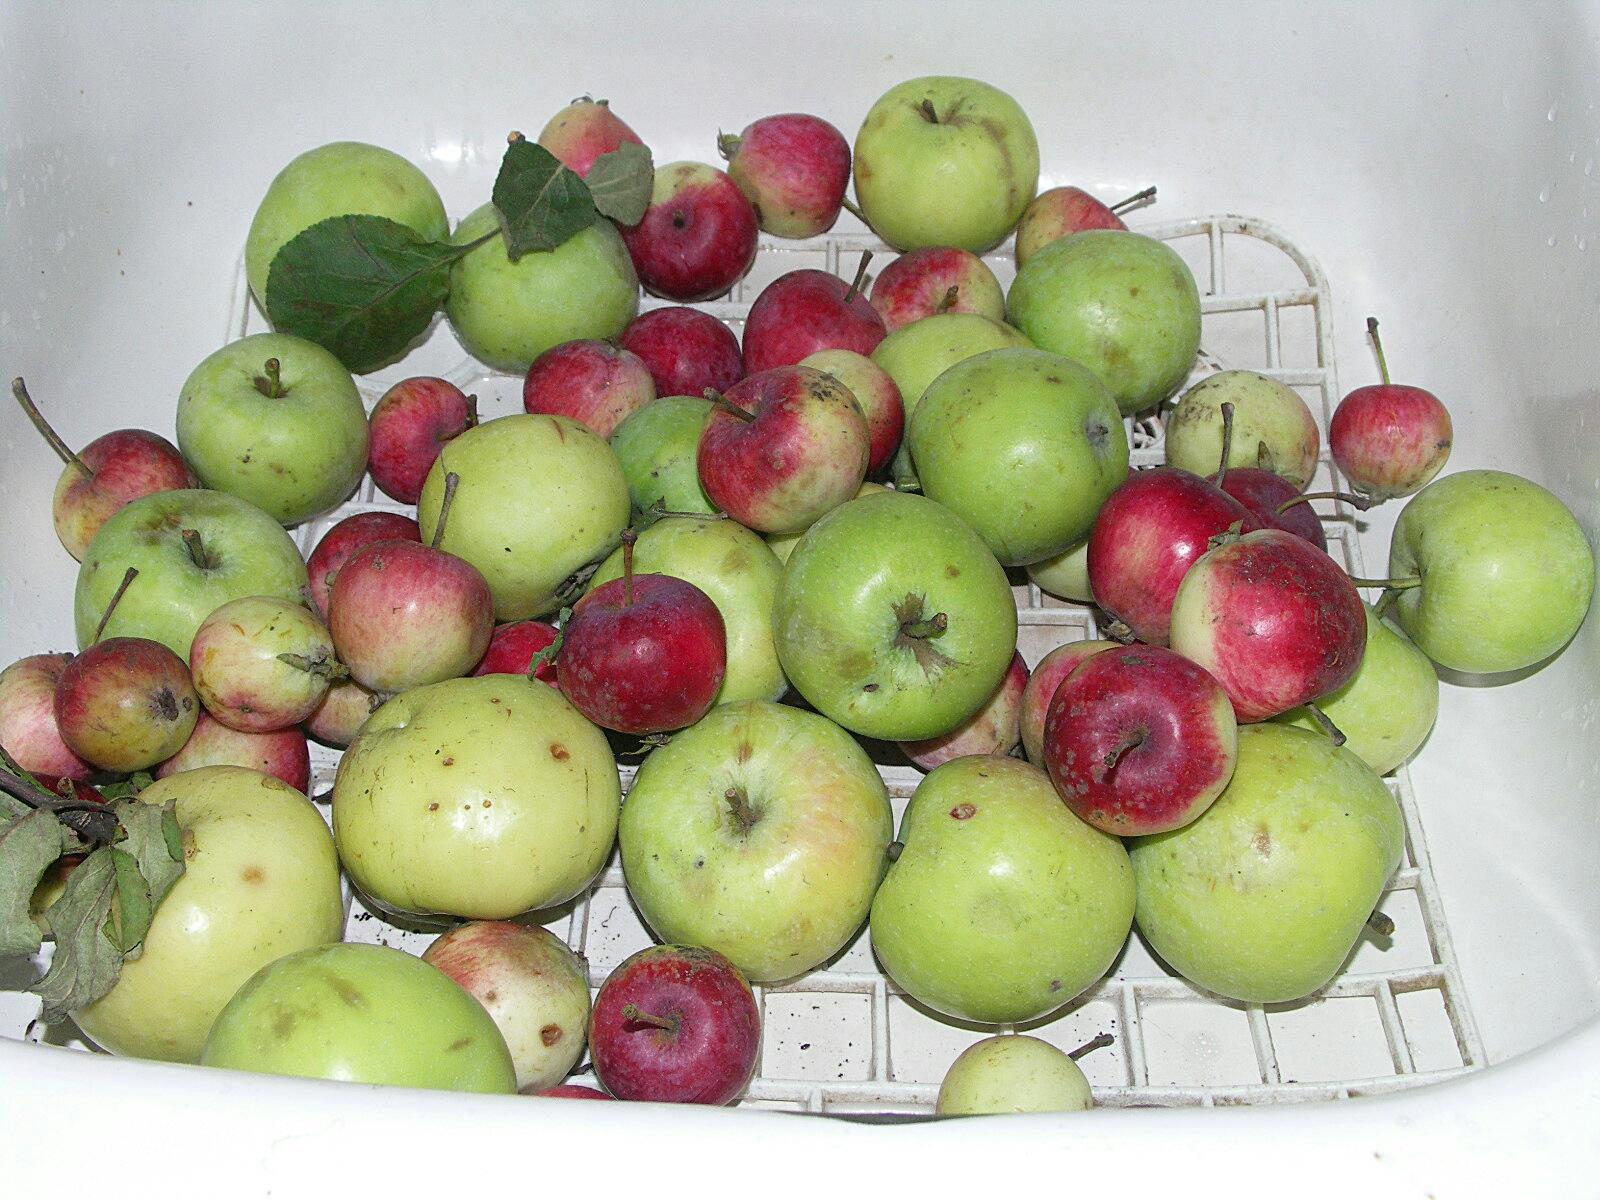 яблоки в раковине